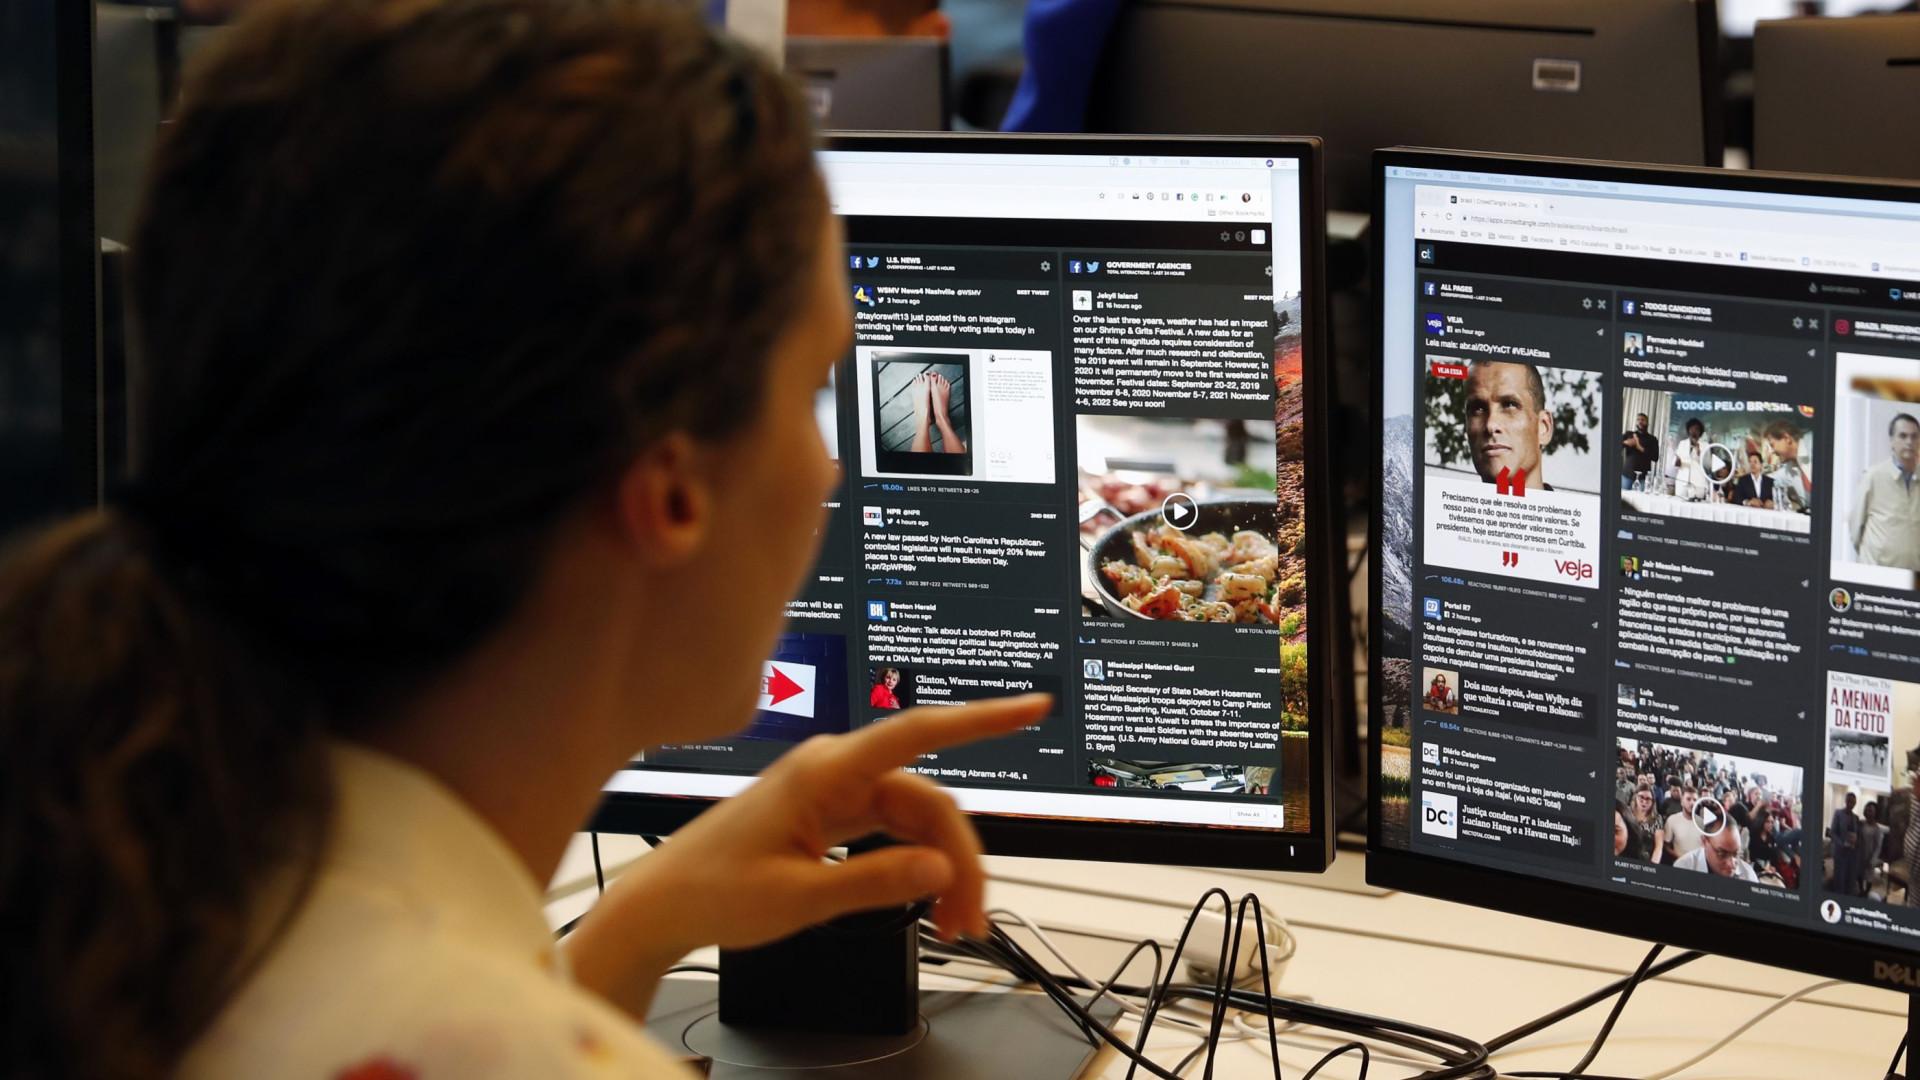 Facebook eliminou mais de 14 mi de conteúdos pró-terroristas este ano